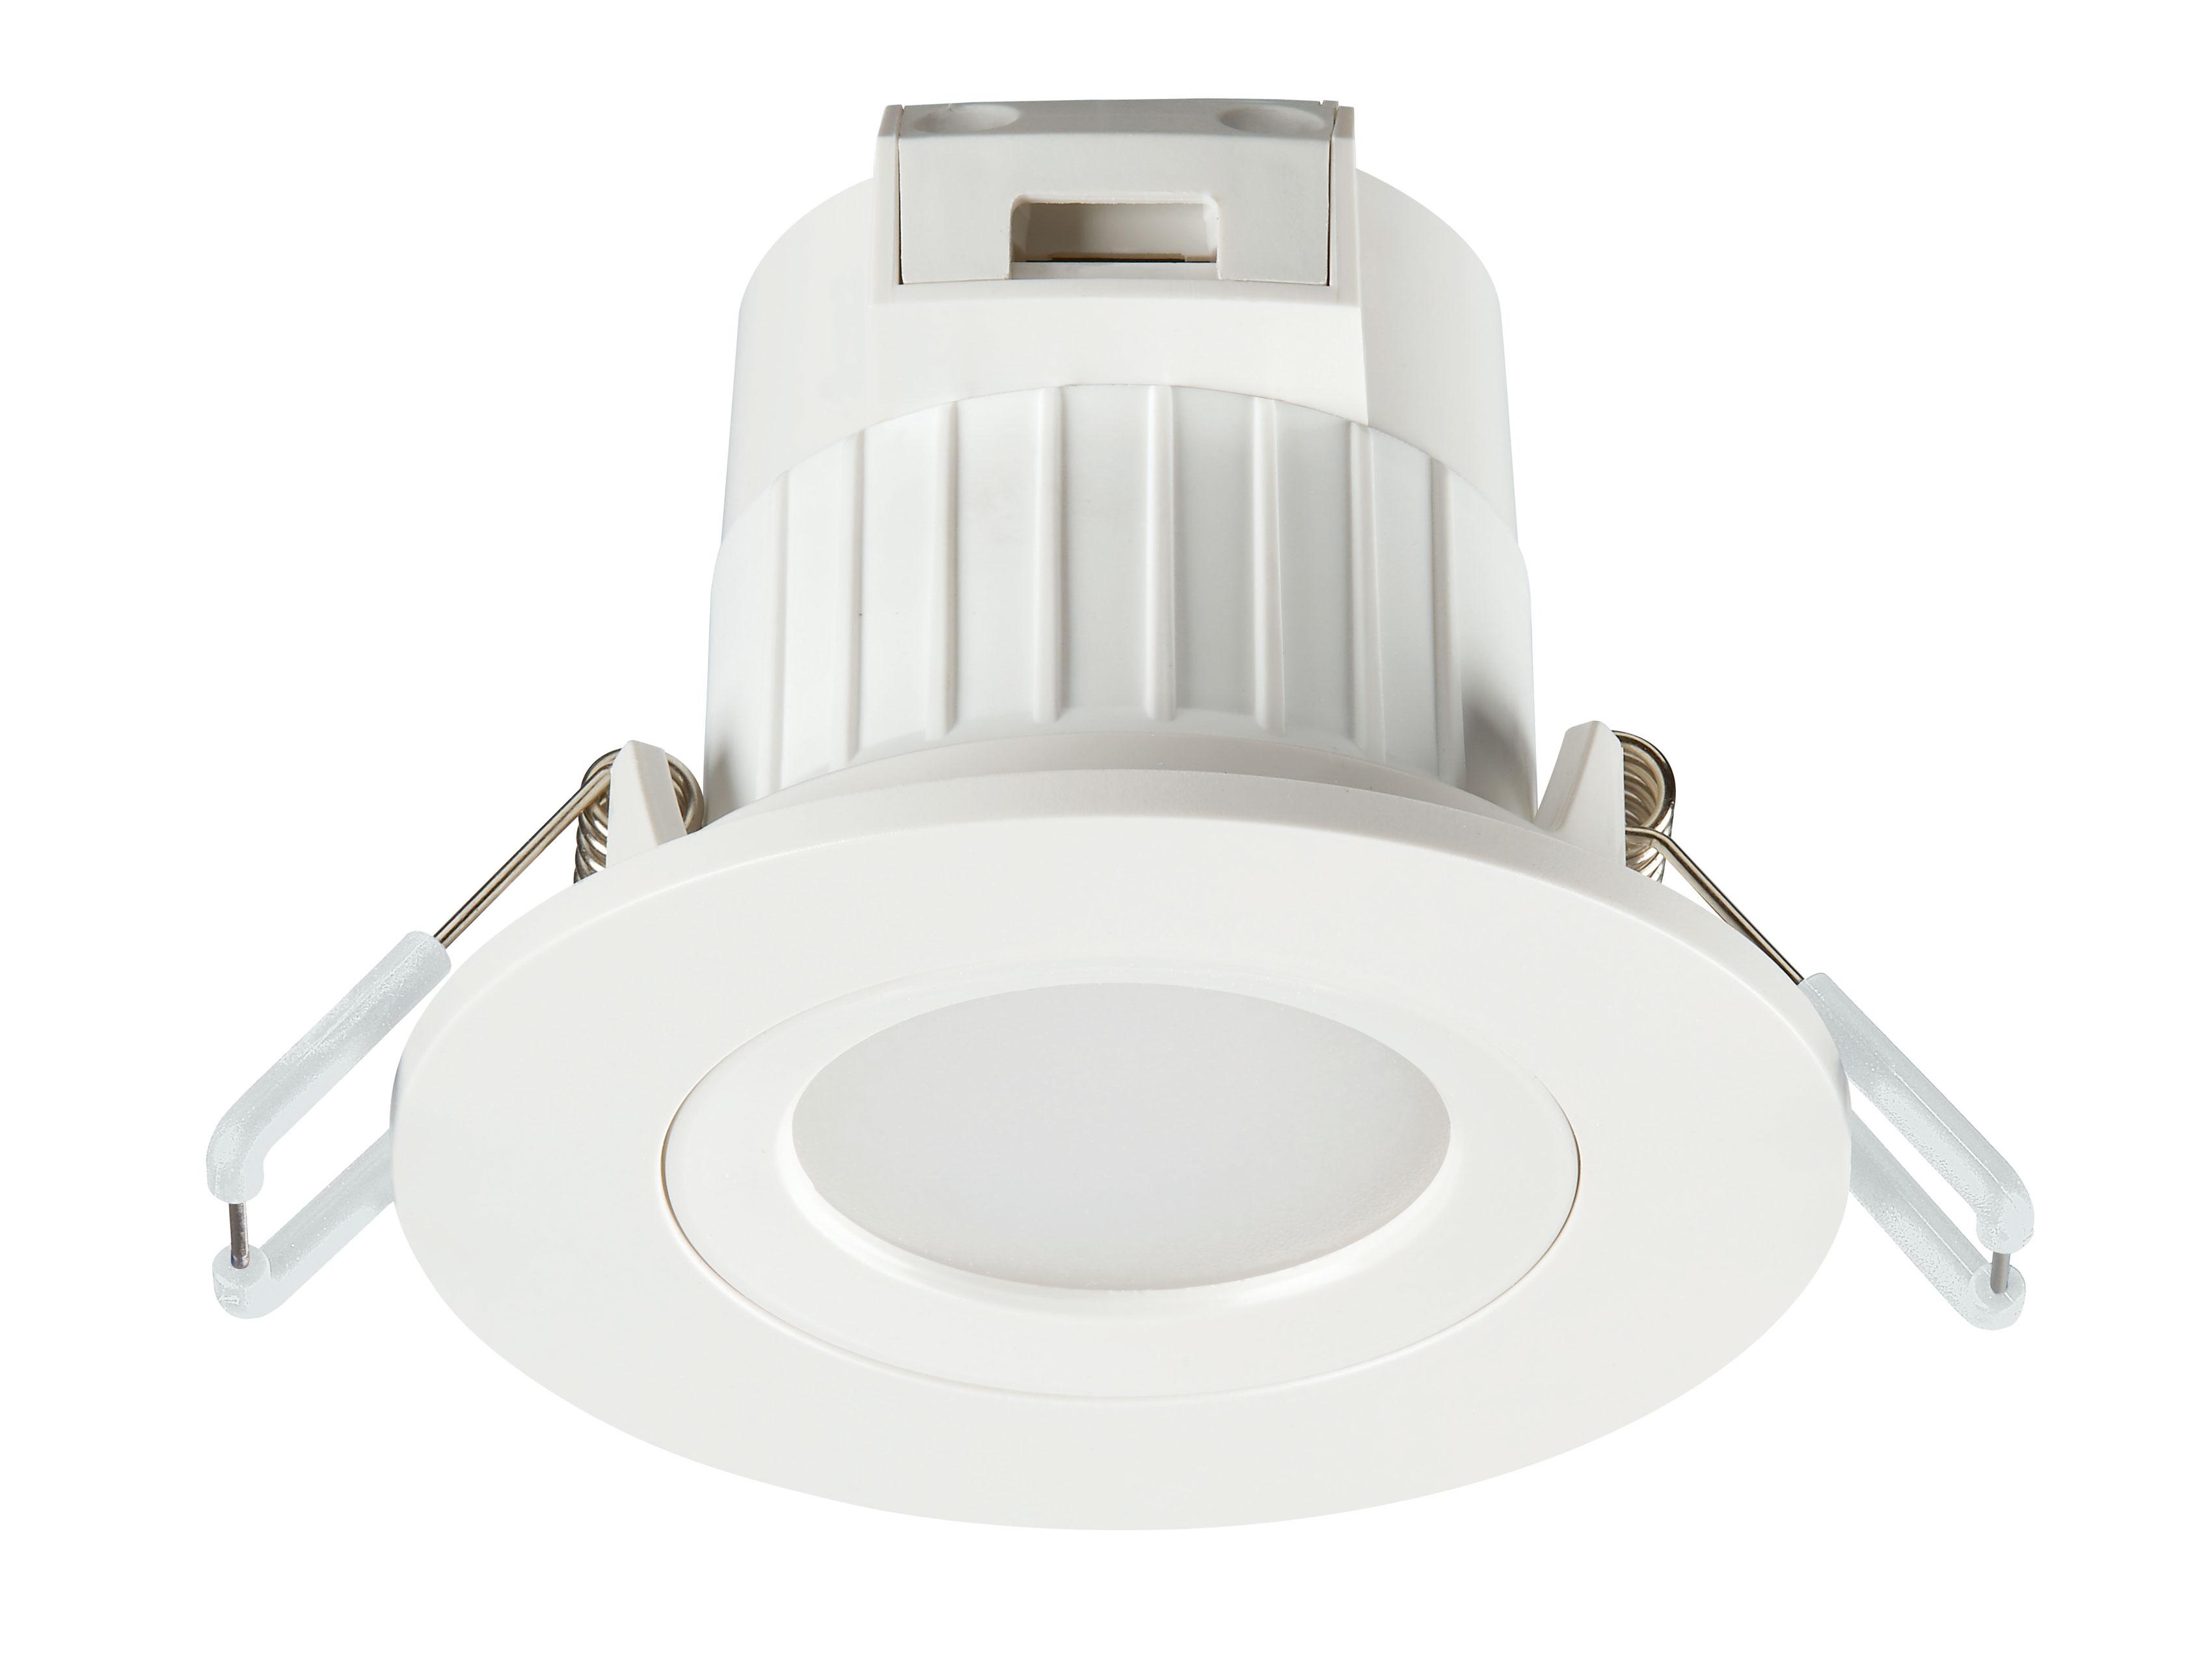 start spot ip65 sylvania lighting solutions. Black Bedroom Furniture Sets. Home Design Ideas